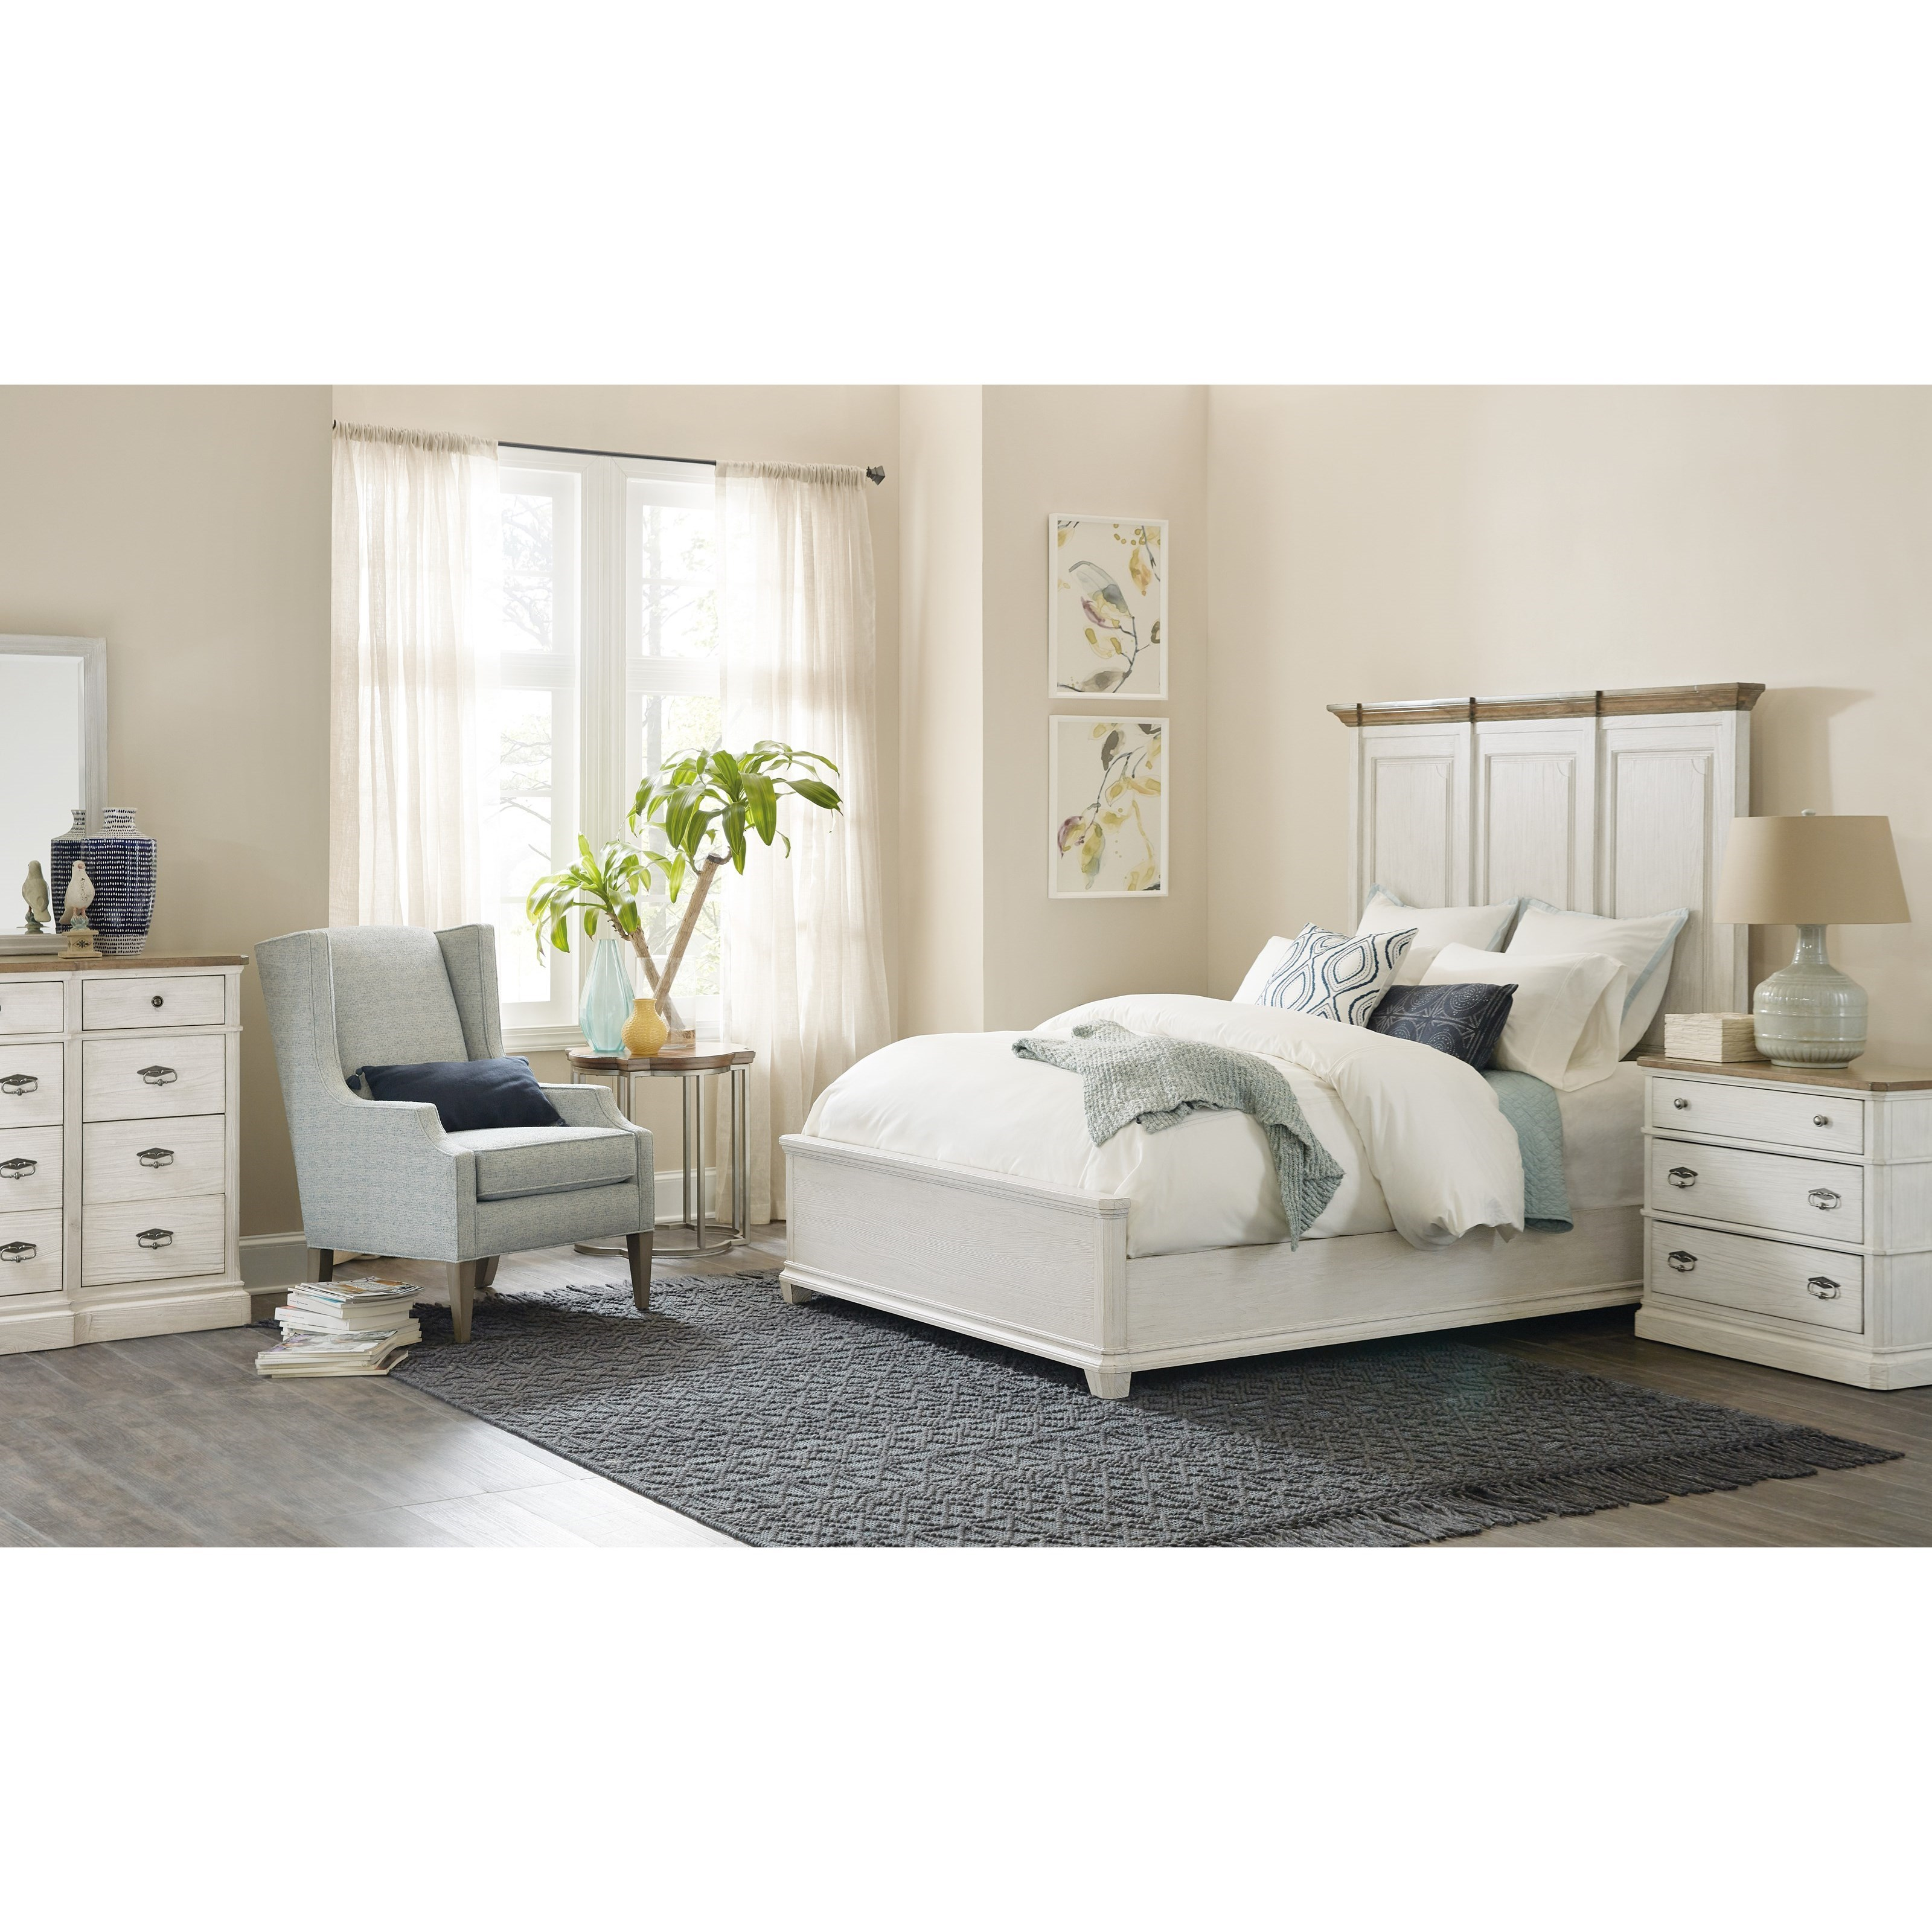 Montebello King Bedroom Group by Hooker Furniture at Baer's Furniture